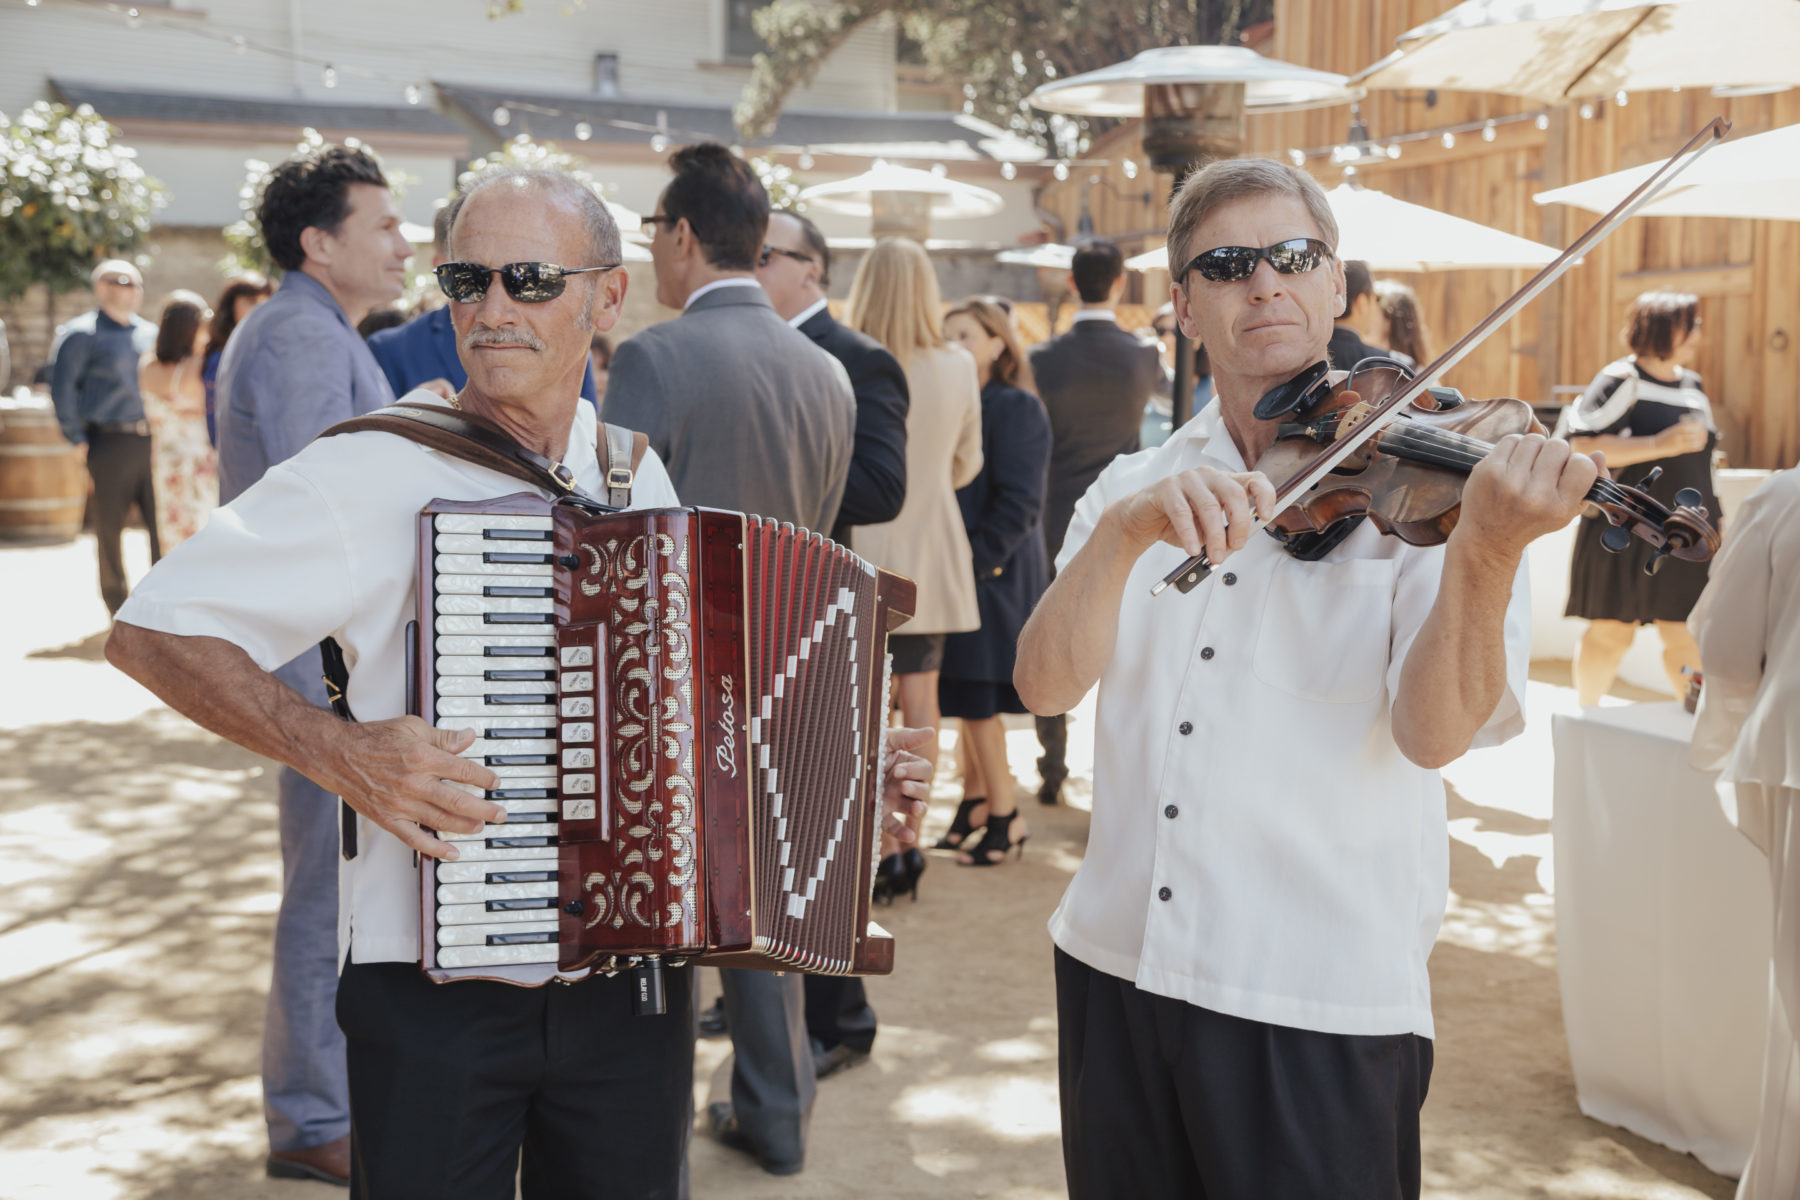 Strolling Musicians at Cooper Molera Barns Event Center